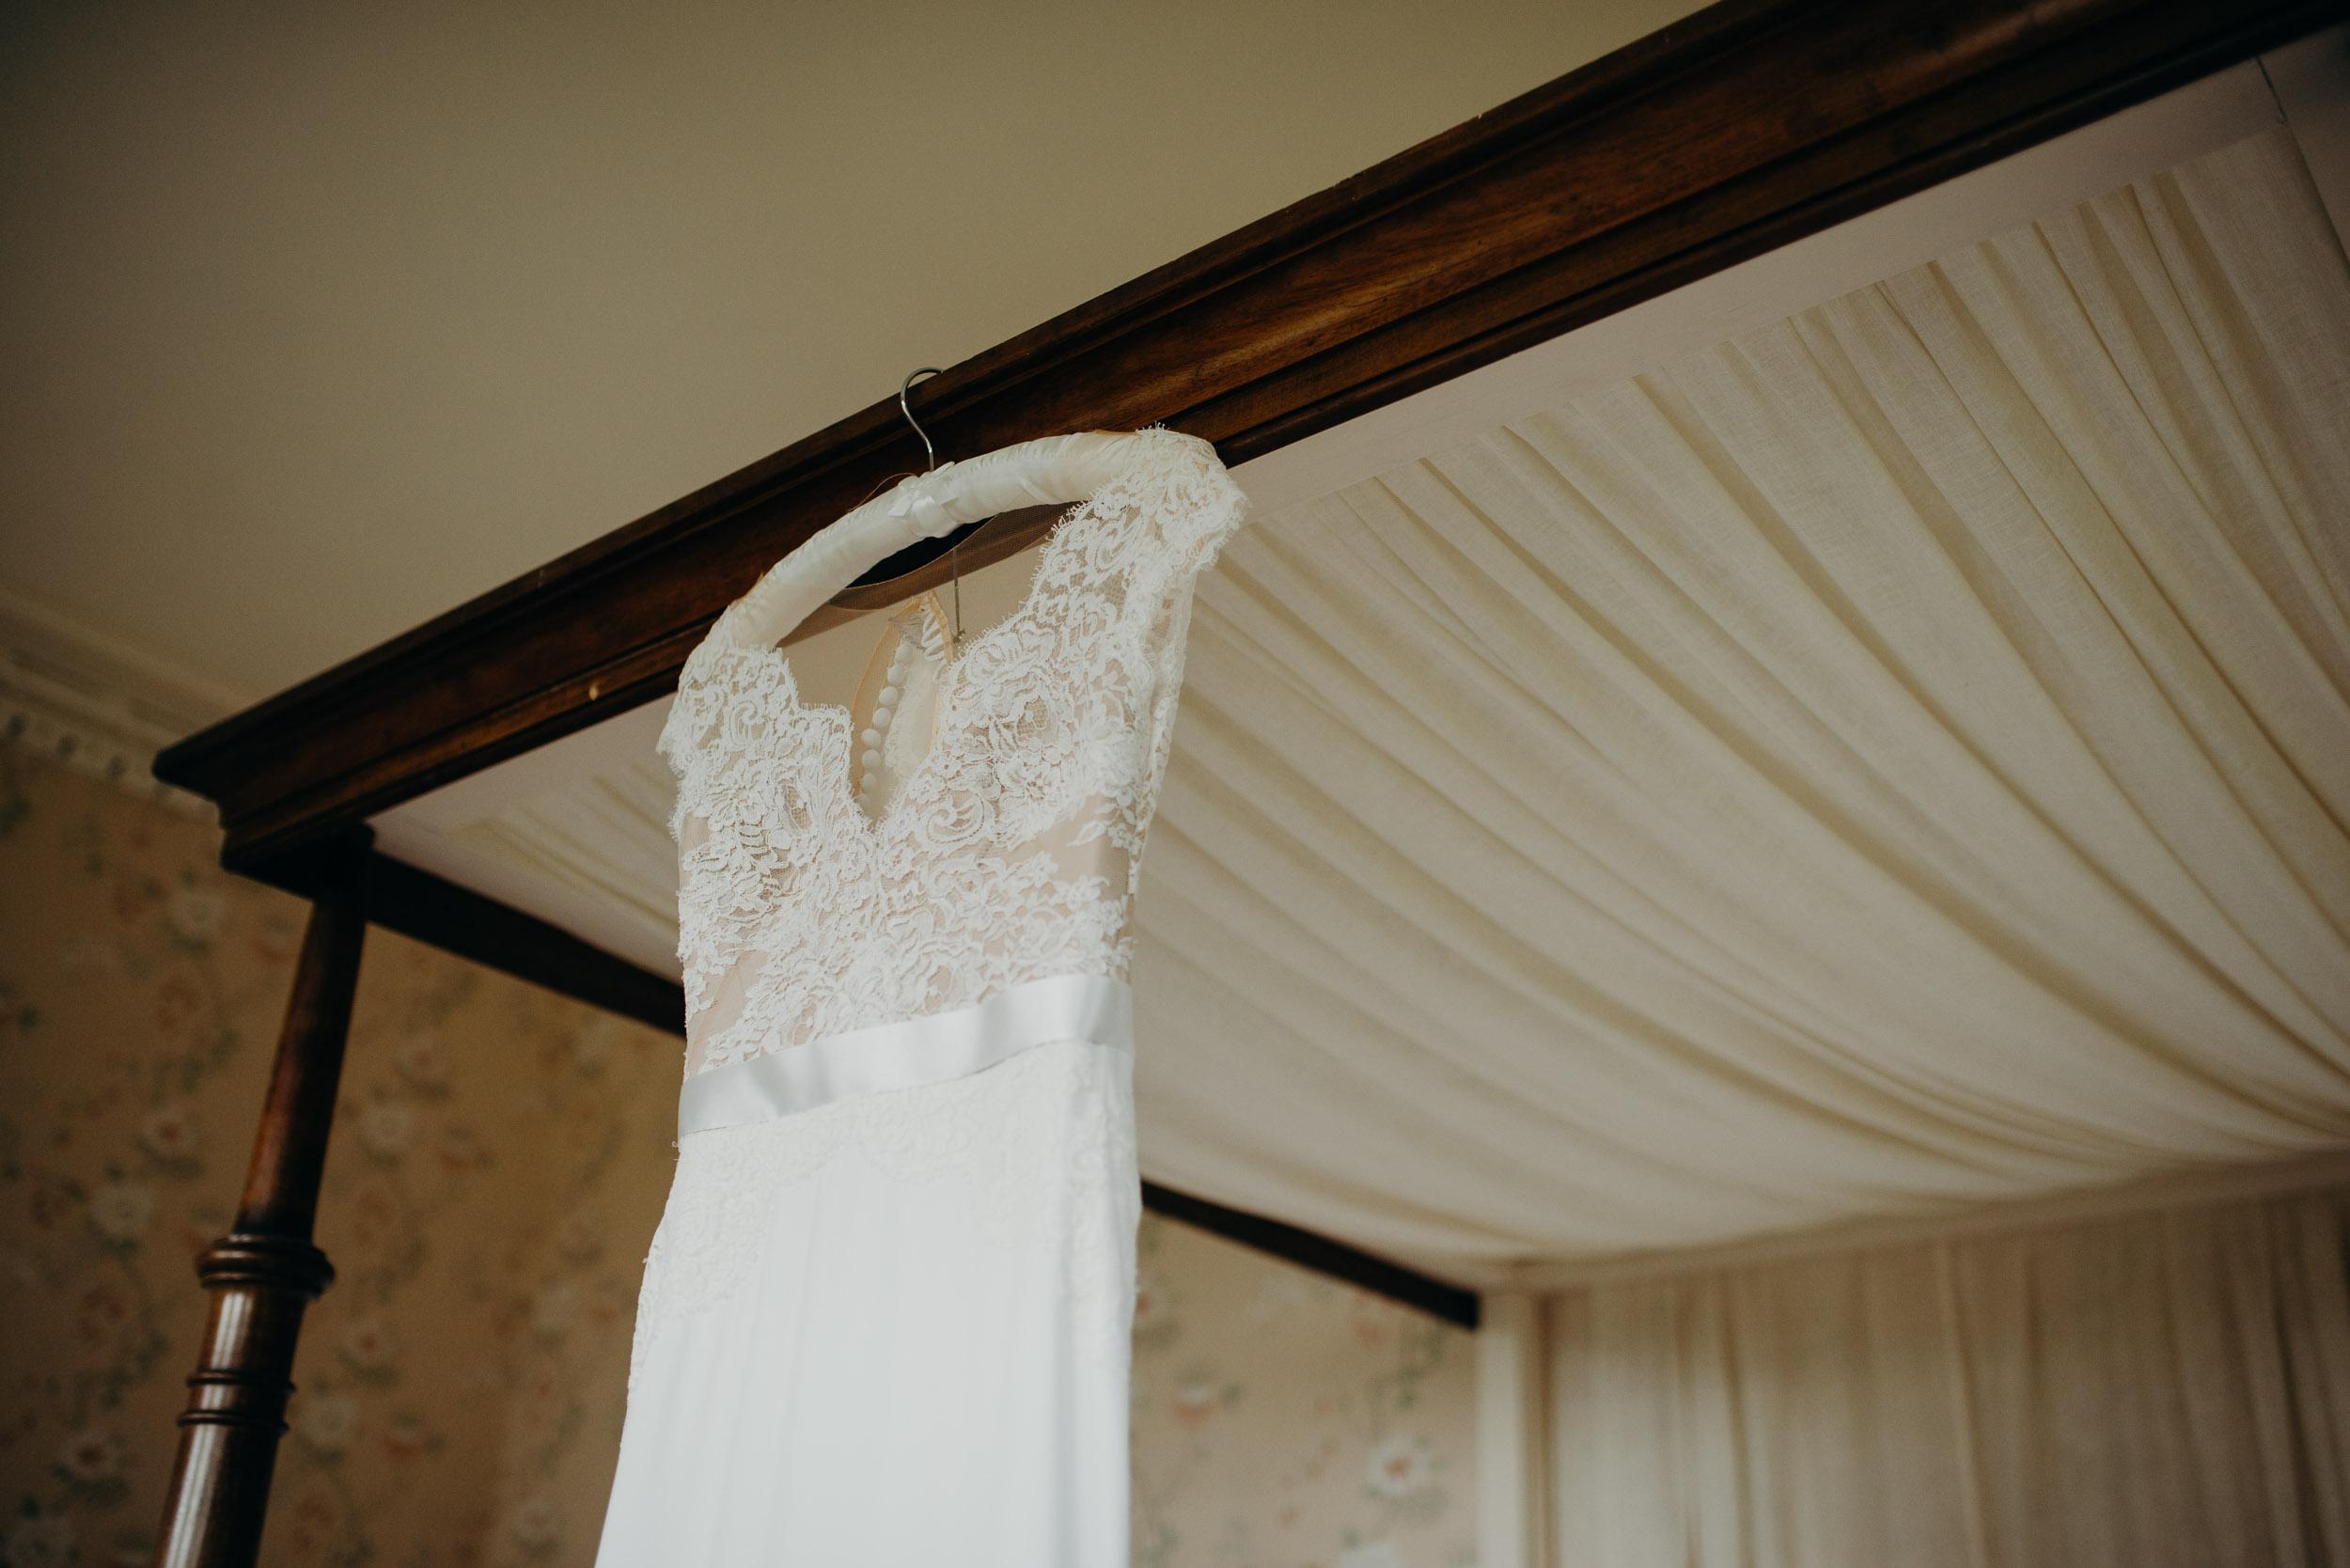 drenagh estate wedding photography-14.jpg